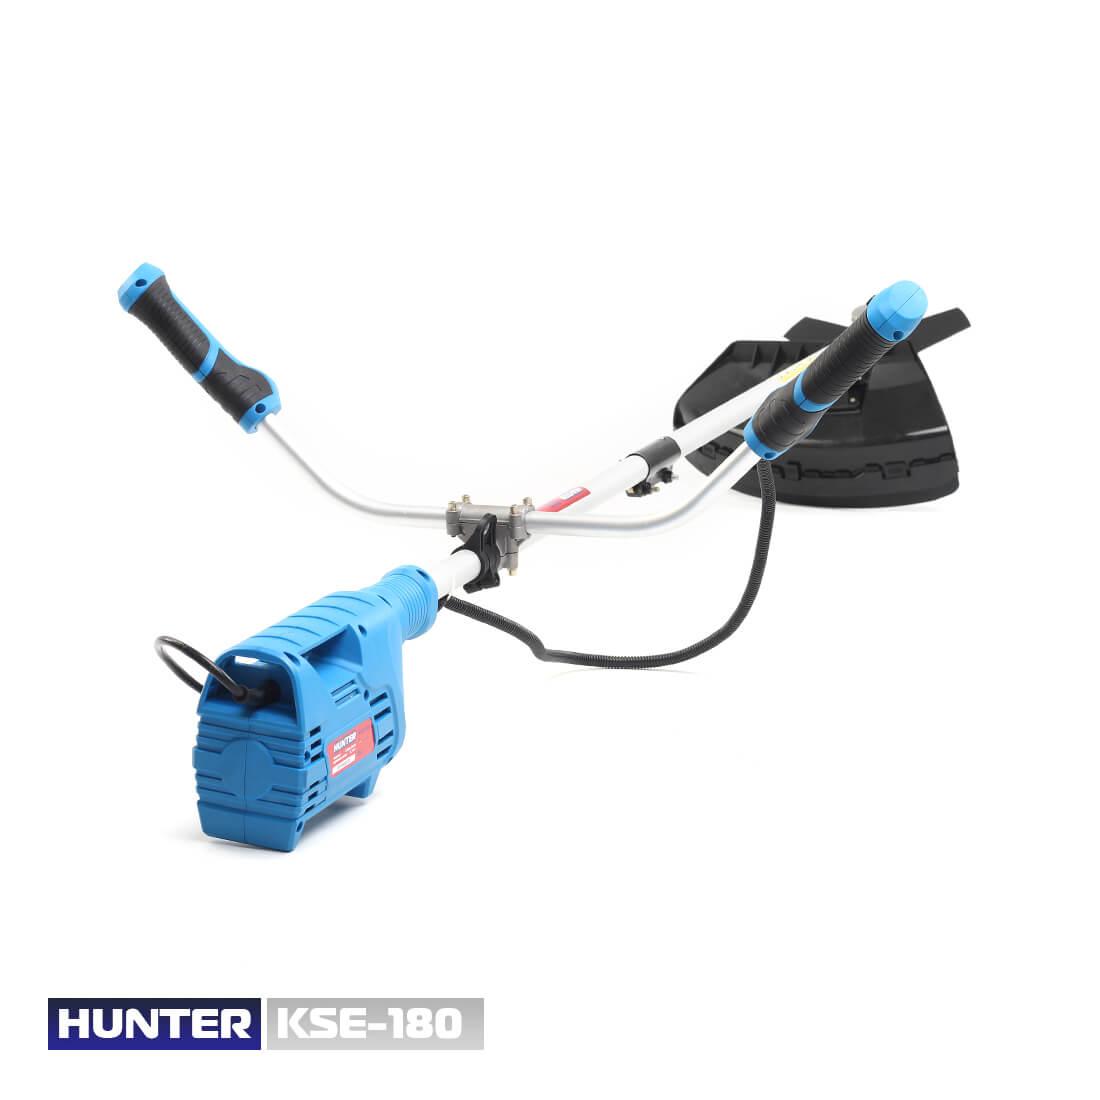 Фото Электрический триммер KSE-180 цена 2300грн №2 — Hunter